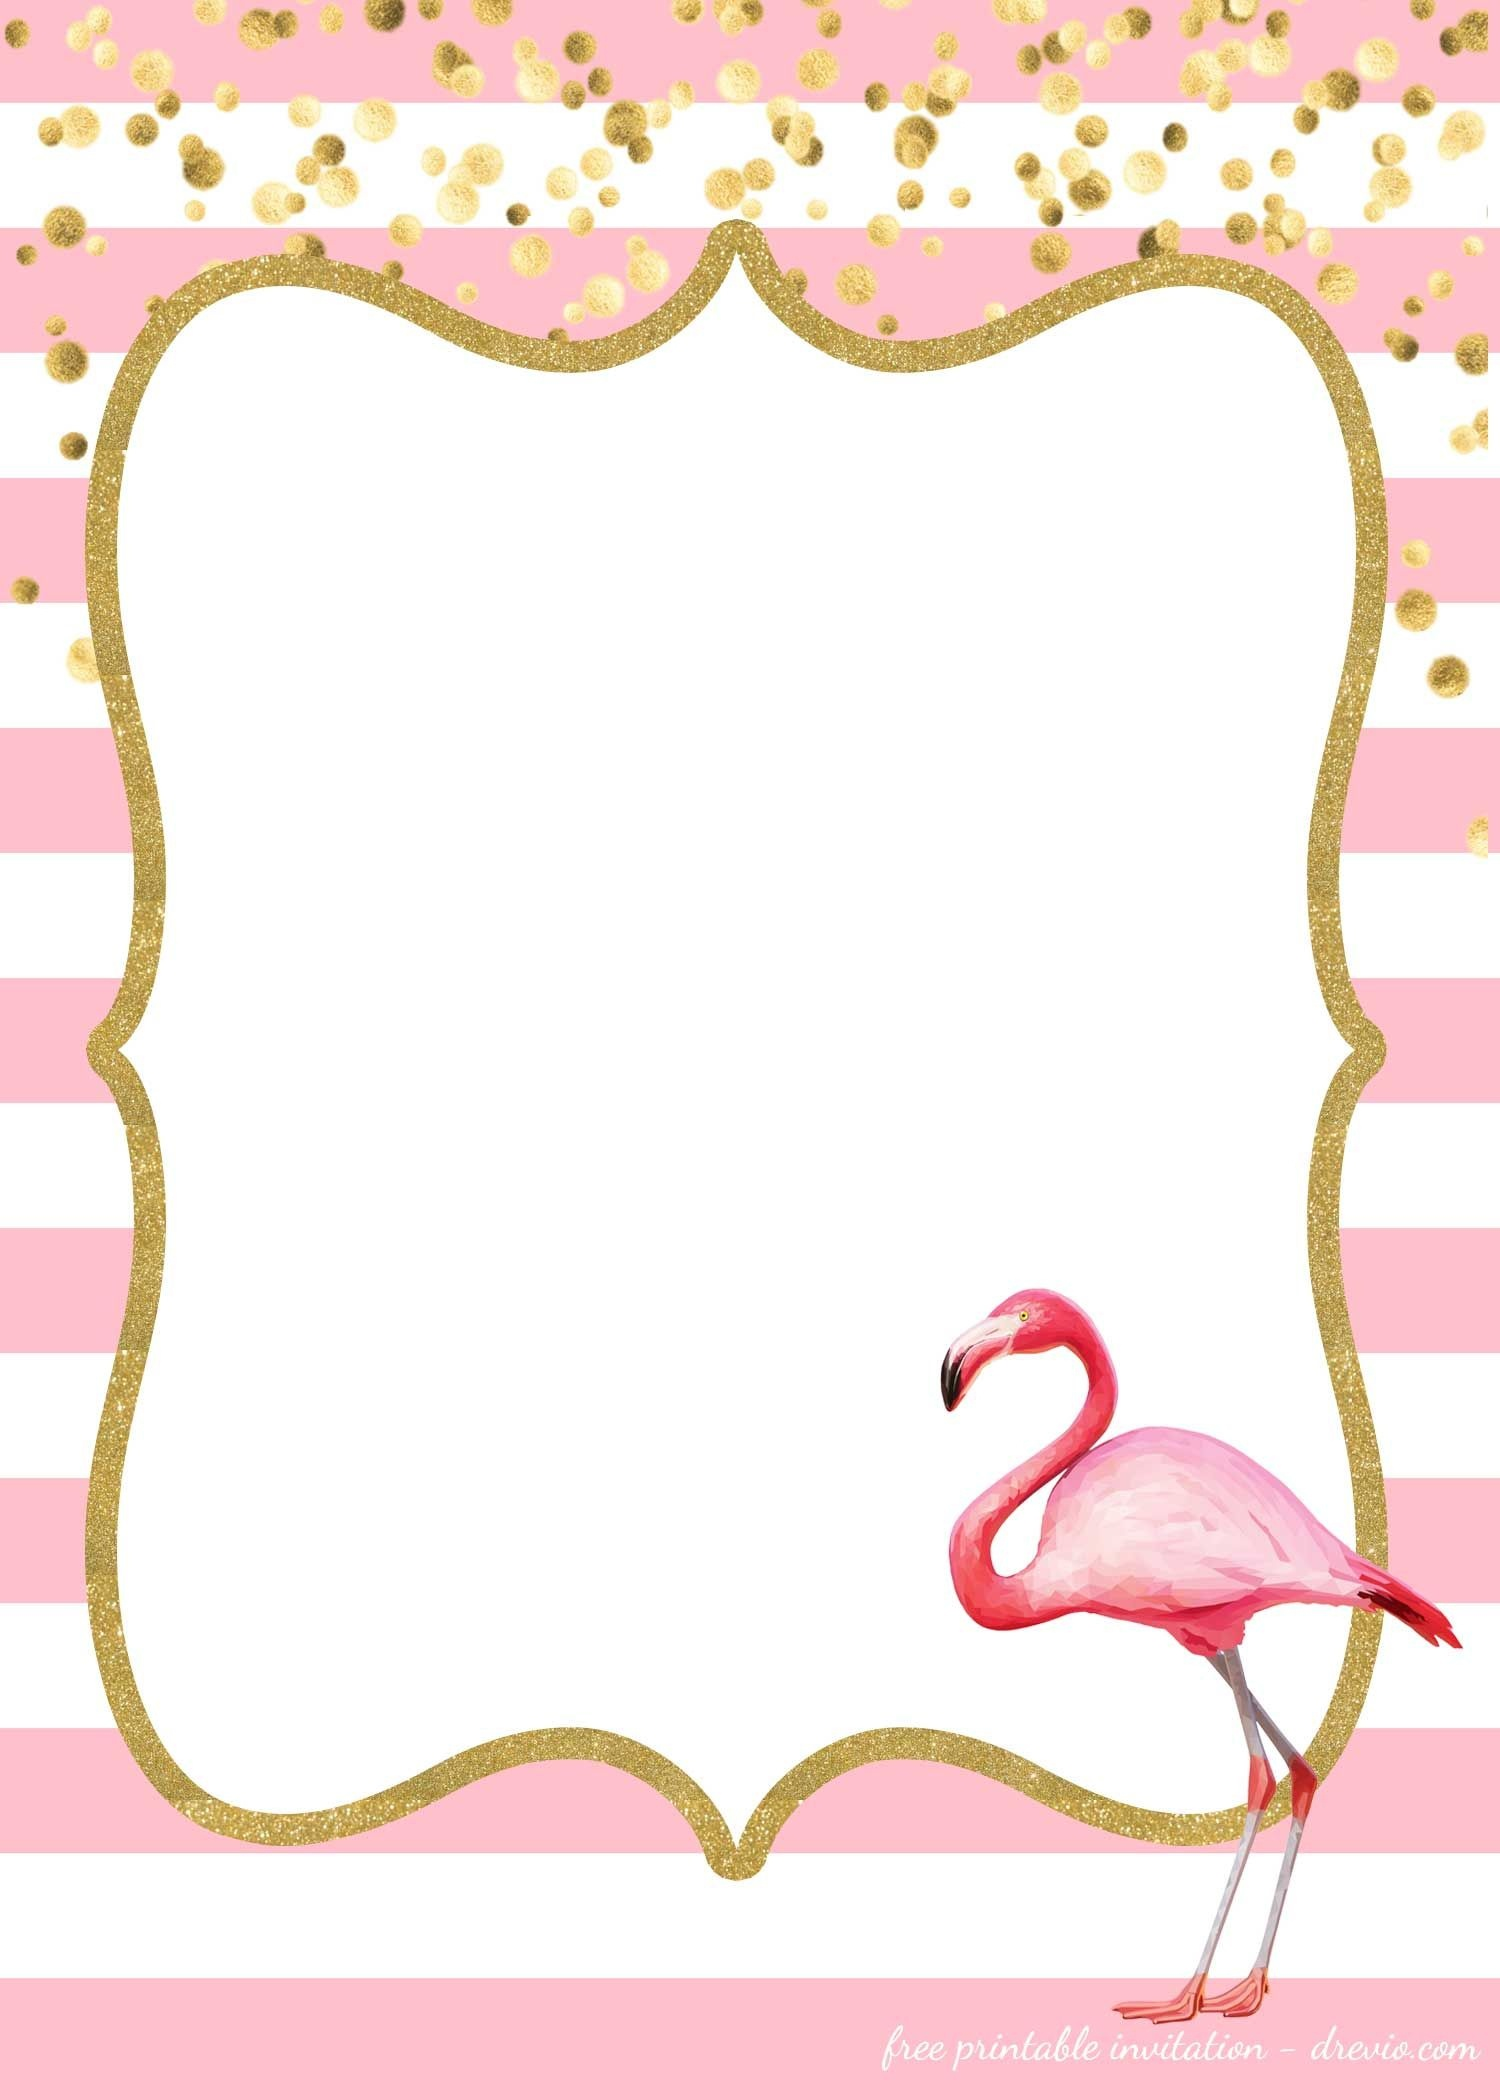 Free Flamingo Invitations Templates - Downloadable | Birthday - Free Printable Pineapple Invitations